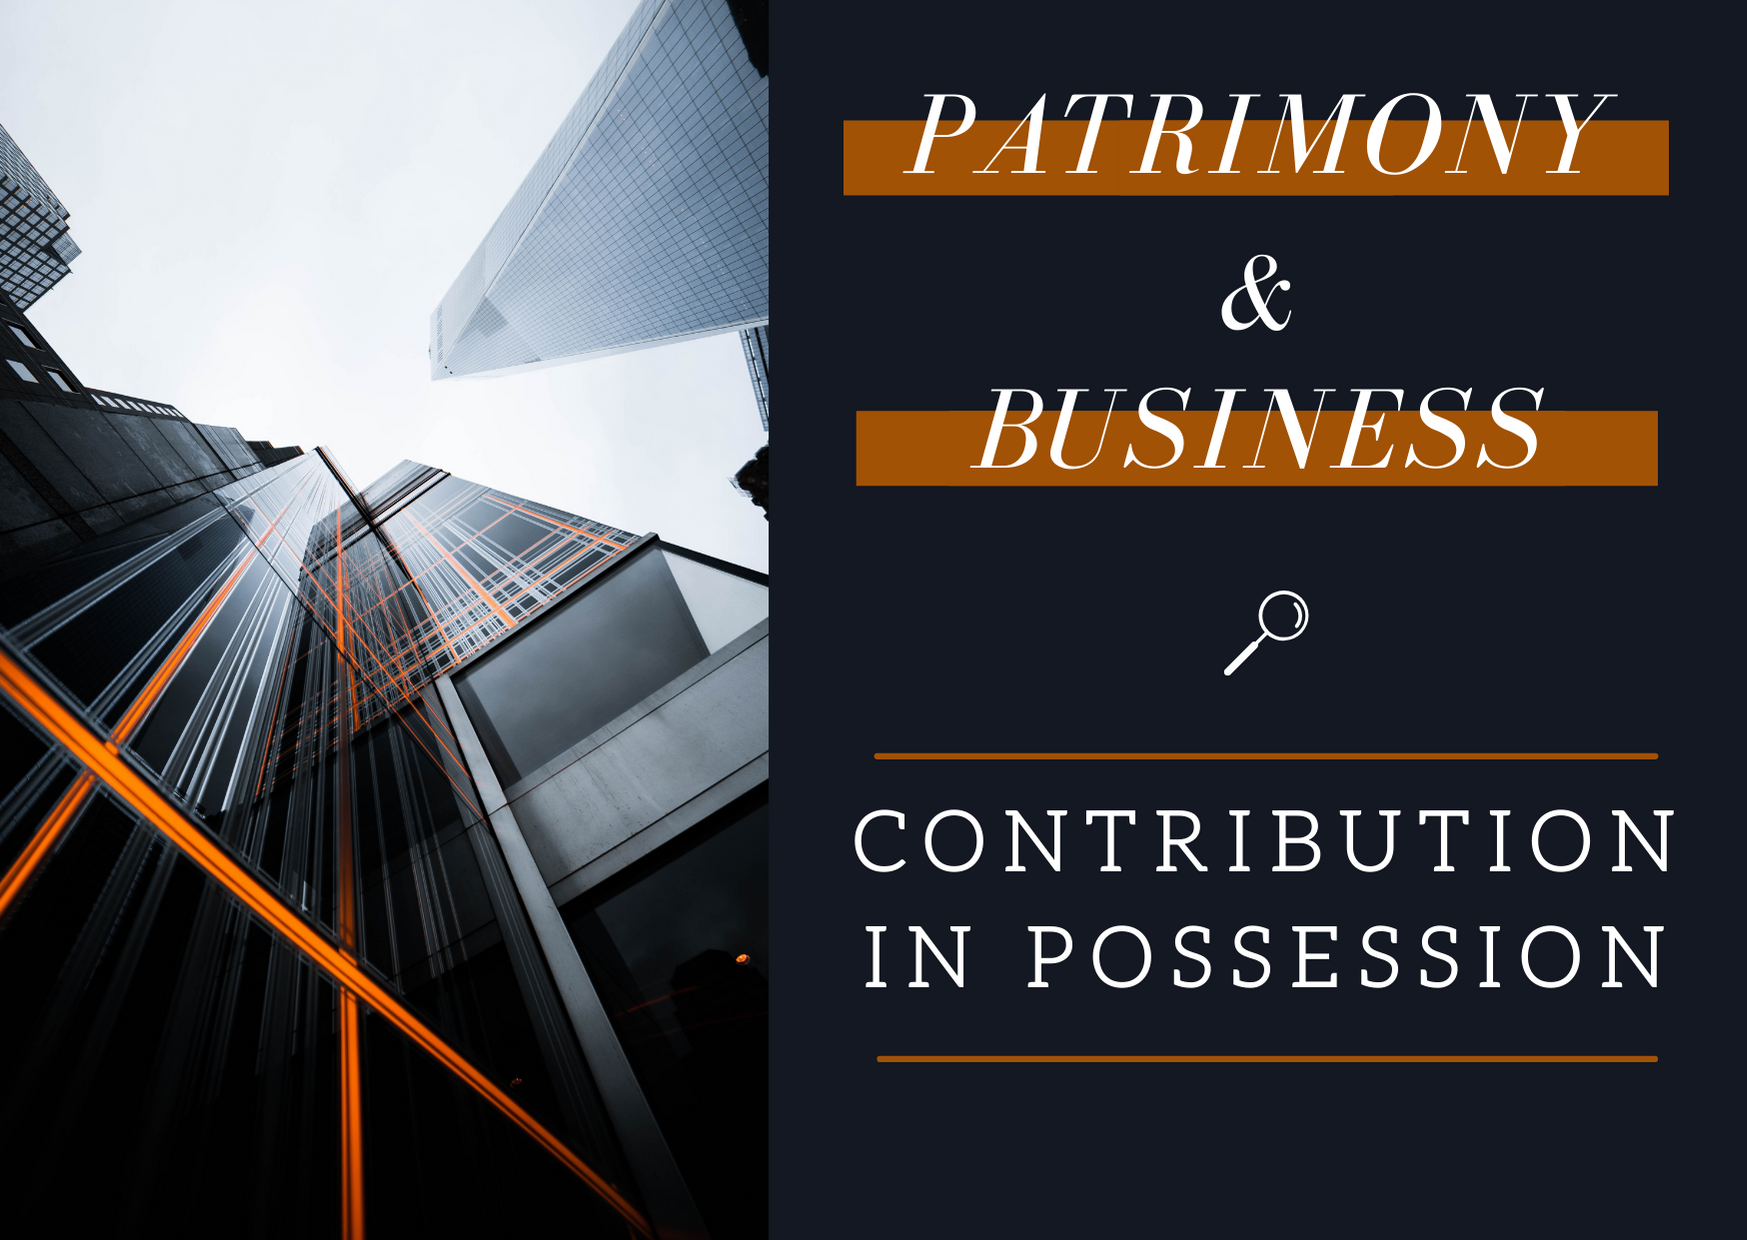 Contribution in possession-Brandon valorisation-valuation of innovation business patrimony